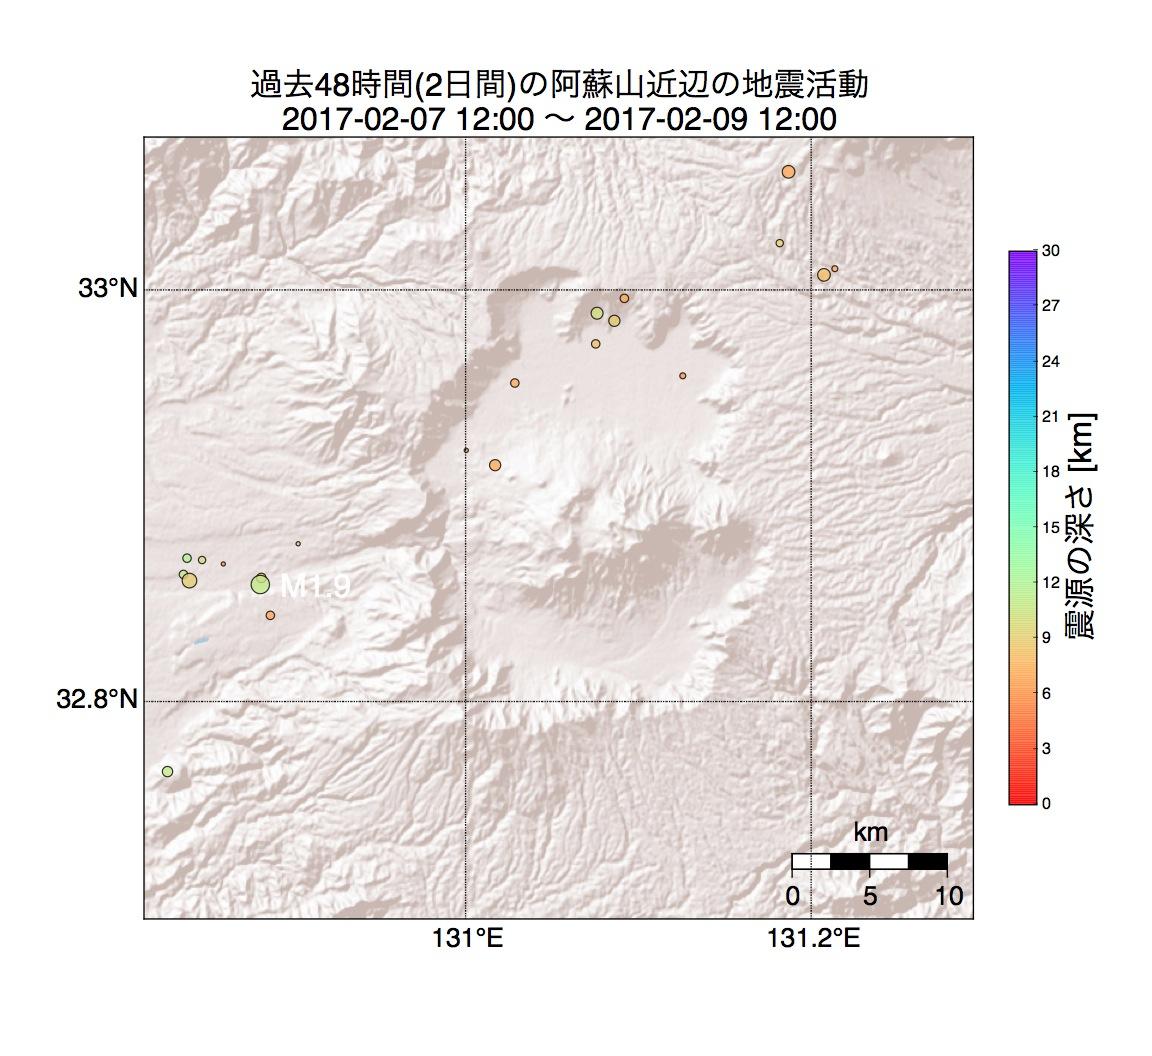 http://jishin.chamu.org/aso/20170209_1.jpg